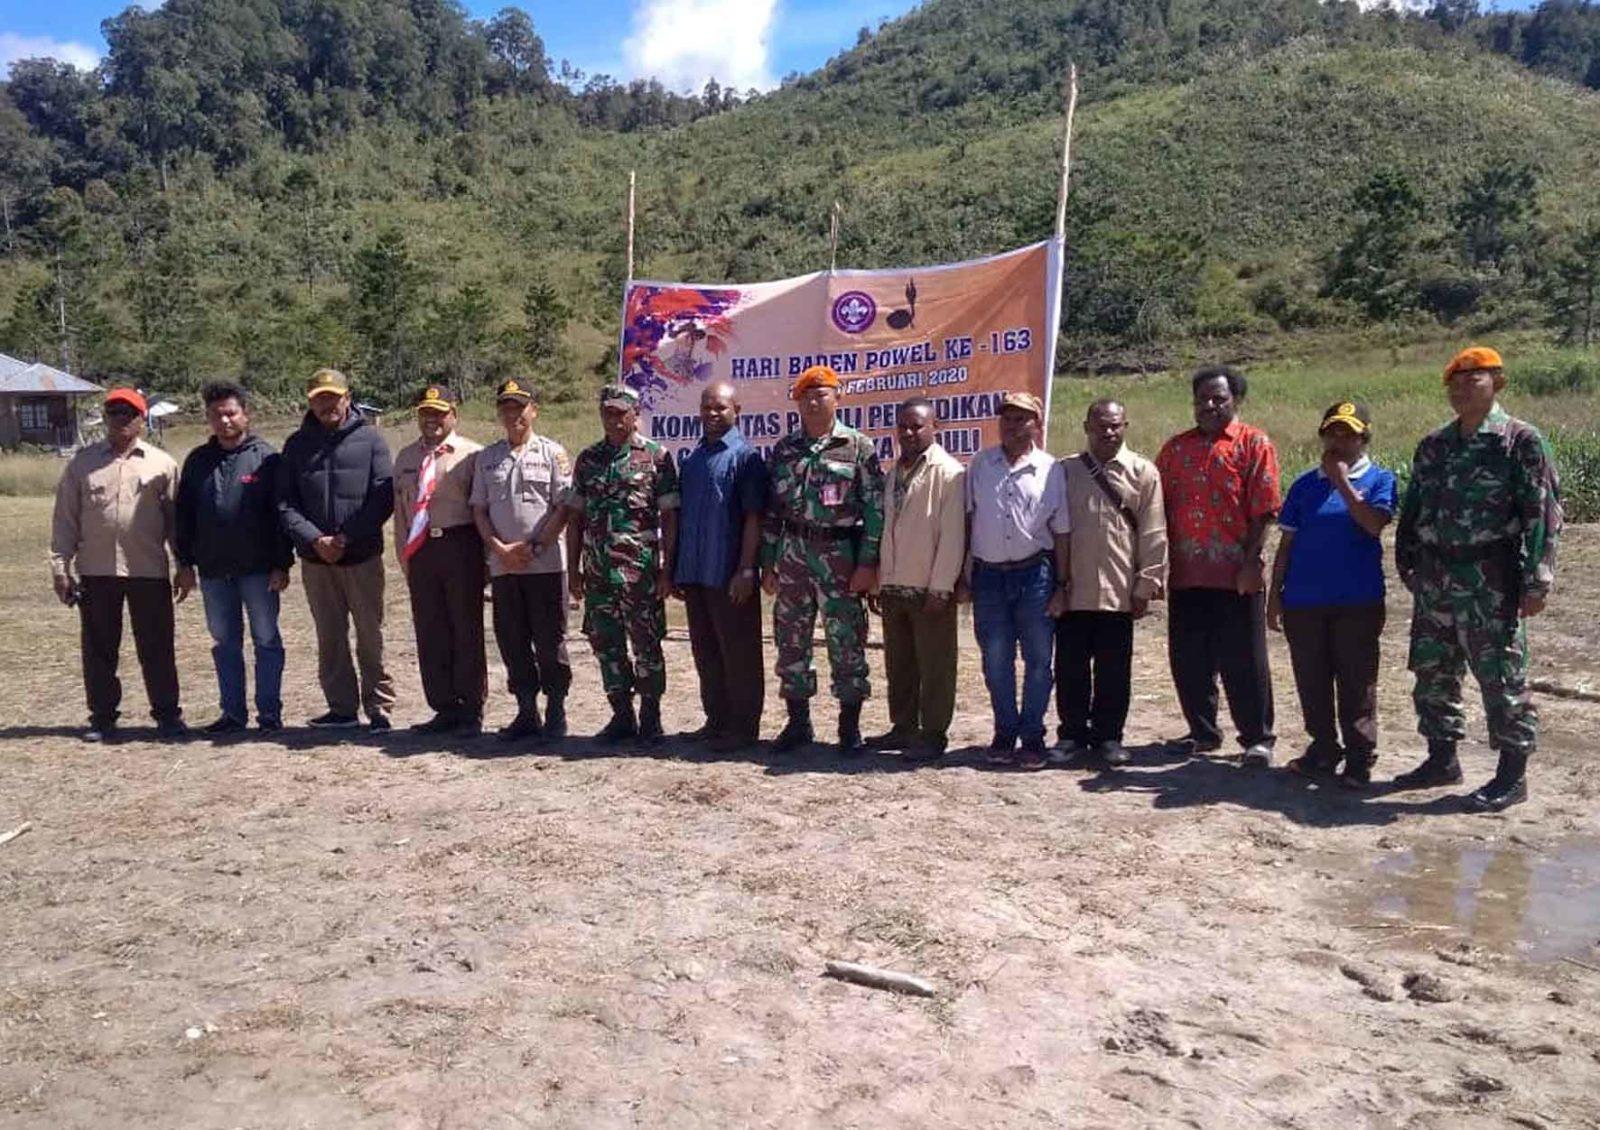 Satgas Pamrahwan Yonko 462 Paskhas Pos Oksibil Menghadiri Acara Peringatan Baden Powell ke-163 di Kab. Pegunungan Bintang